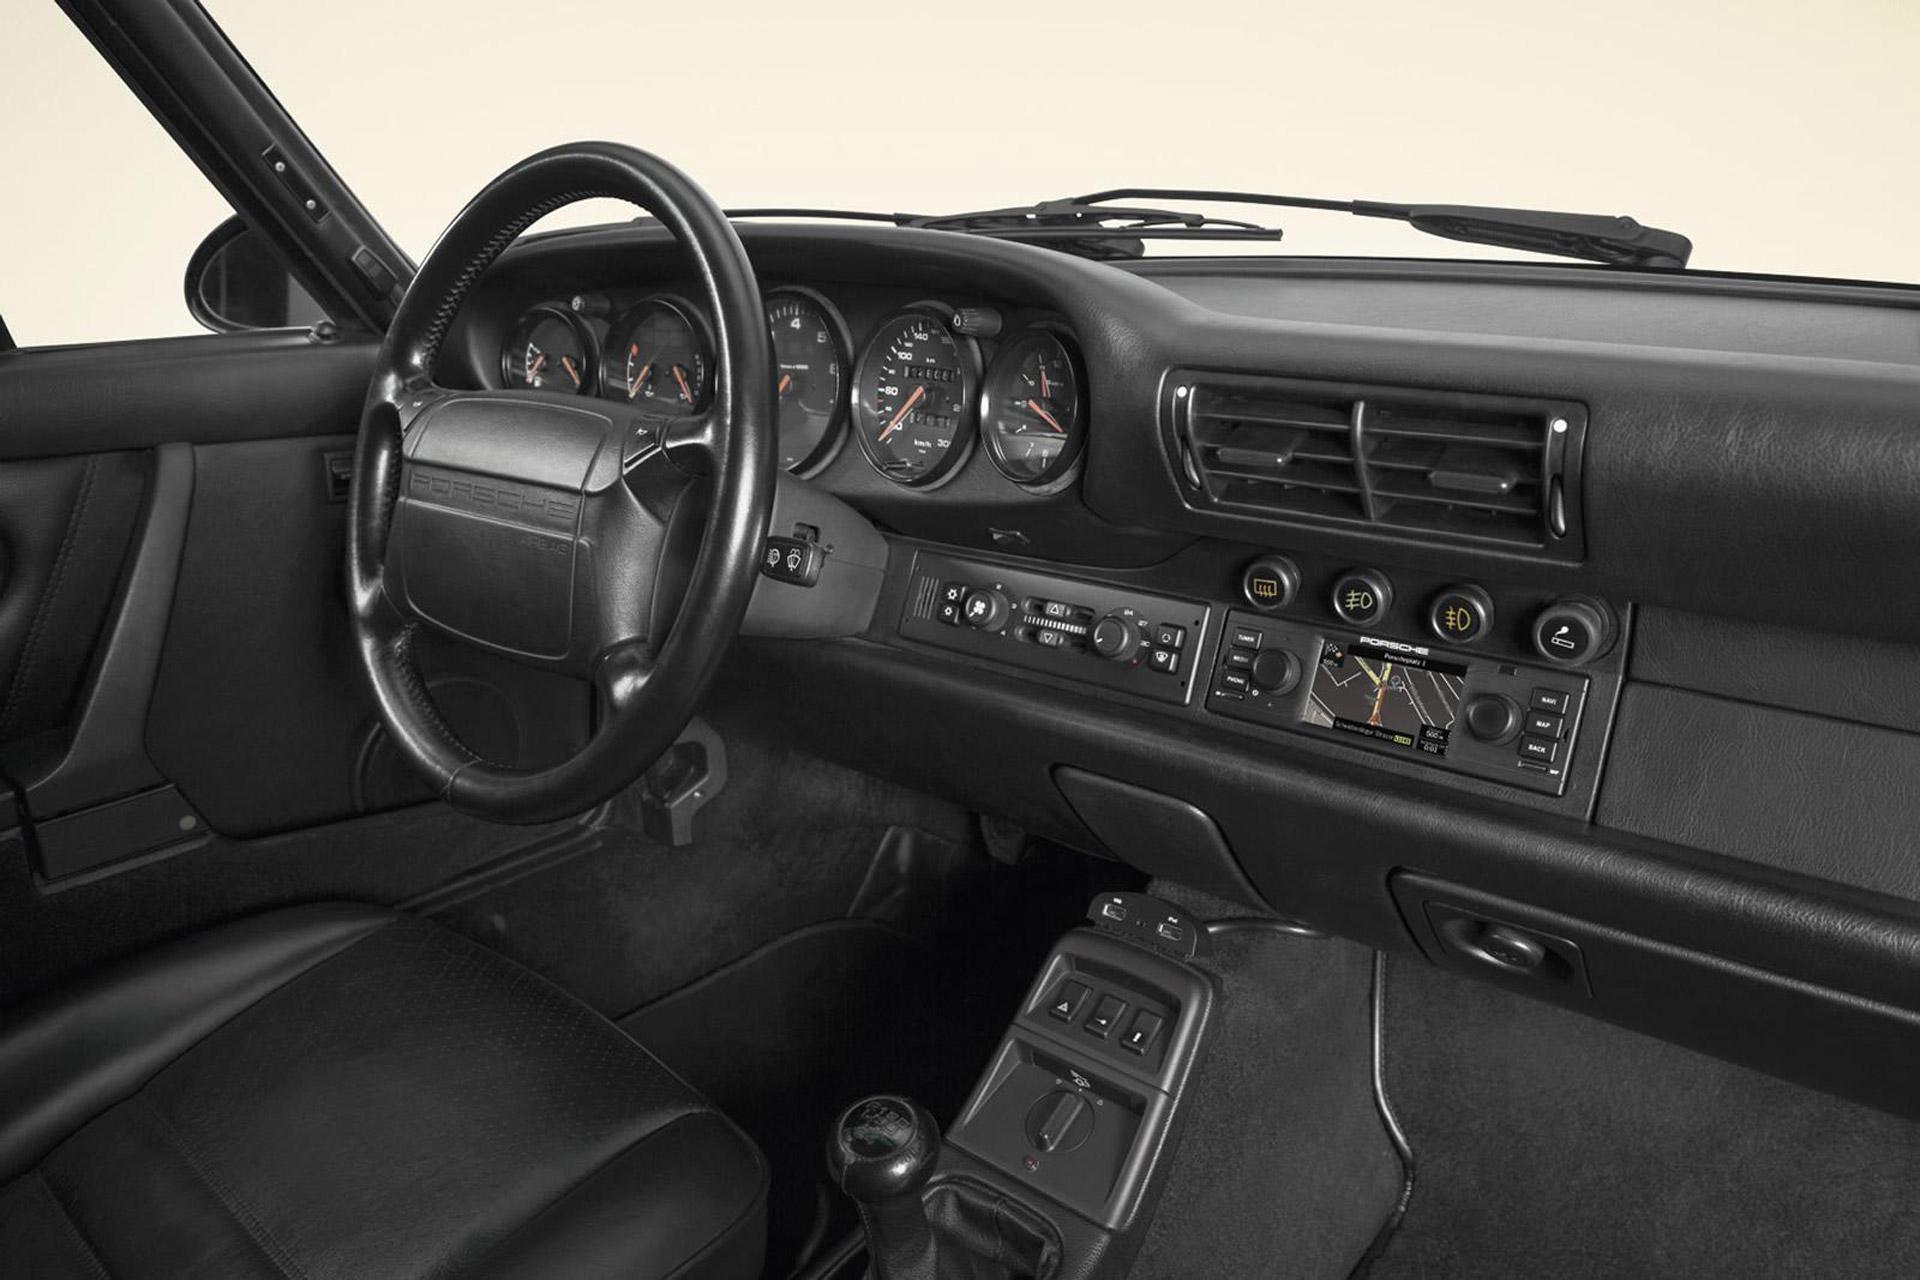 Porsche Classic Develops Uber-Cool Retrofit GPS/Radio For Old 911s: Video